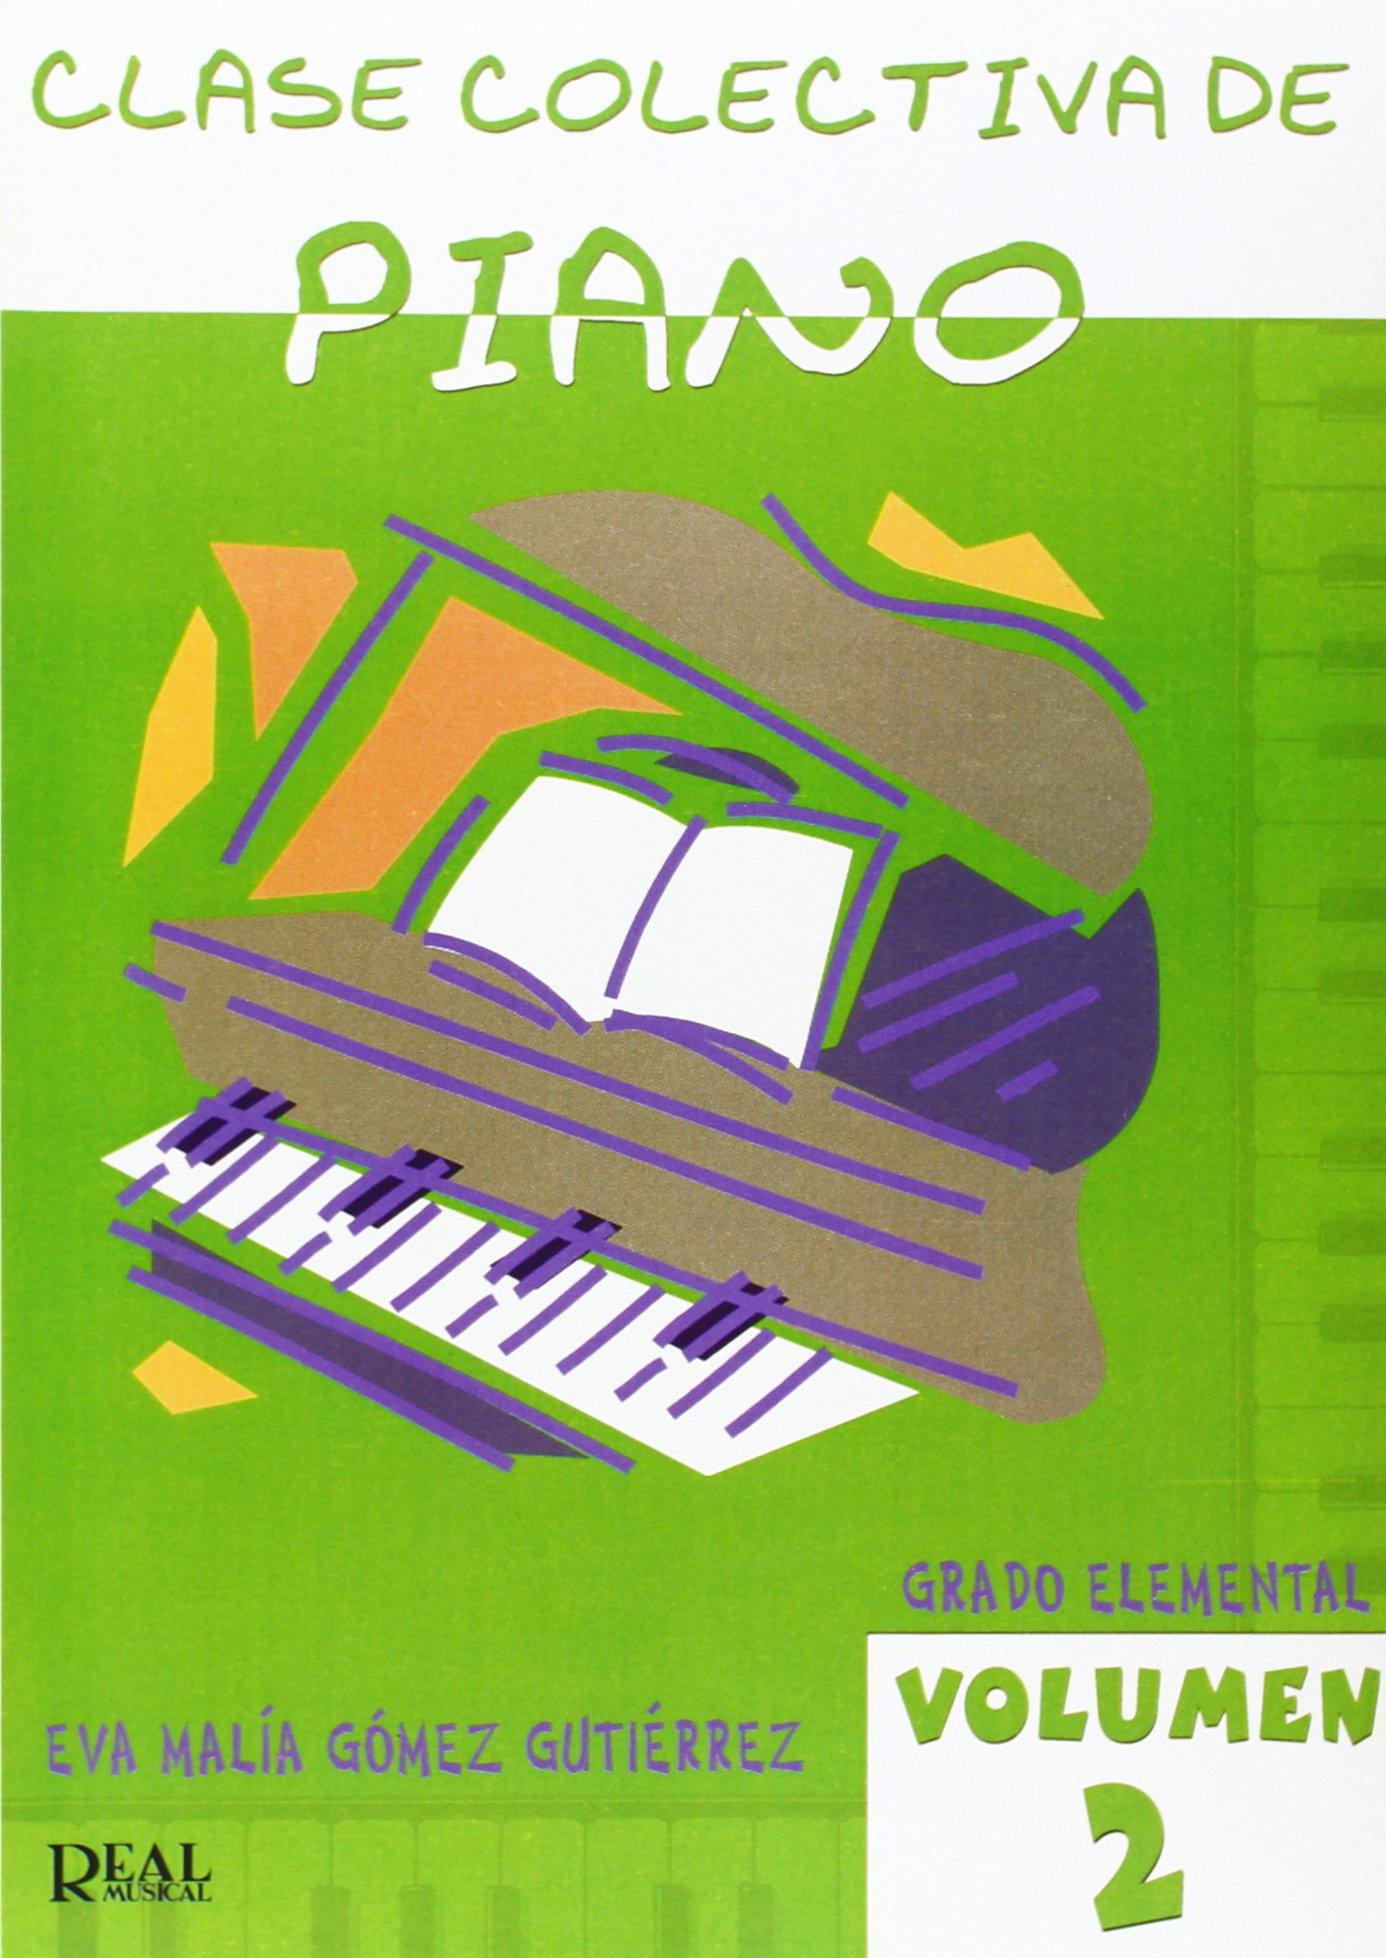 2 GRADO ELEMENTAL (Castilian) Sheet music – 2004